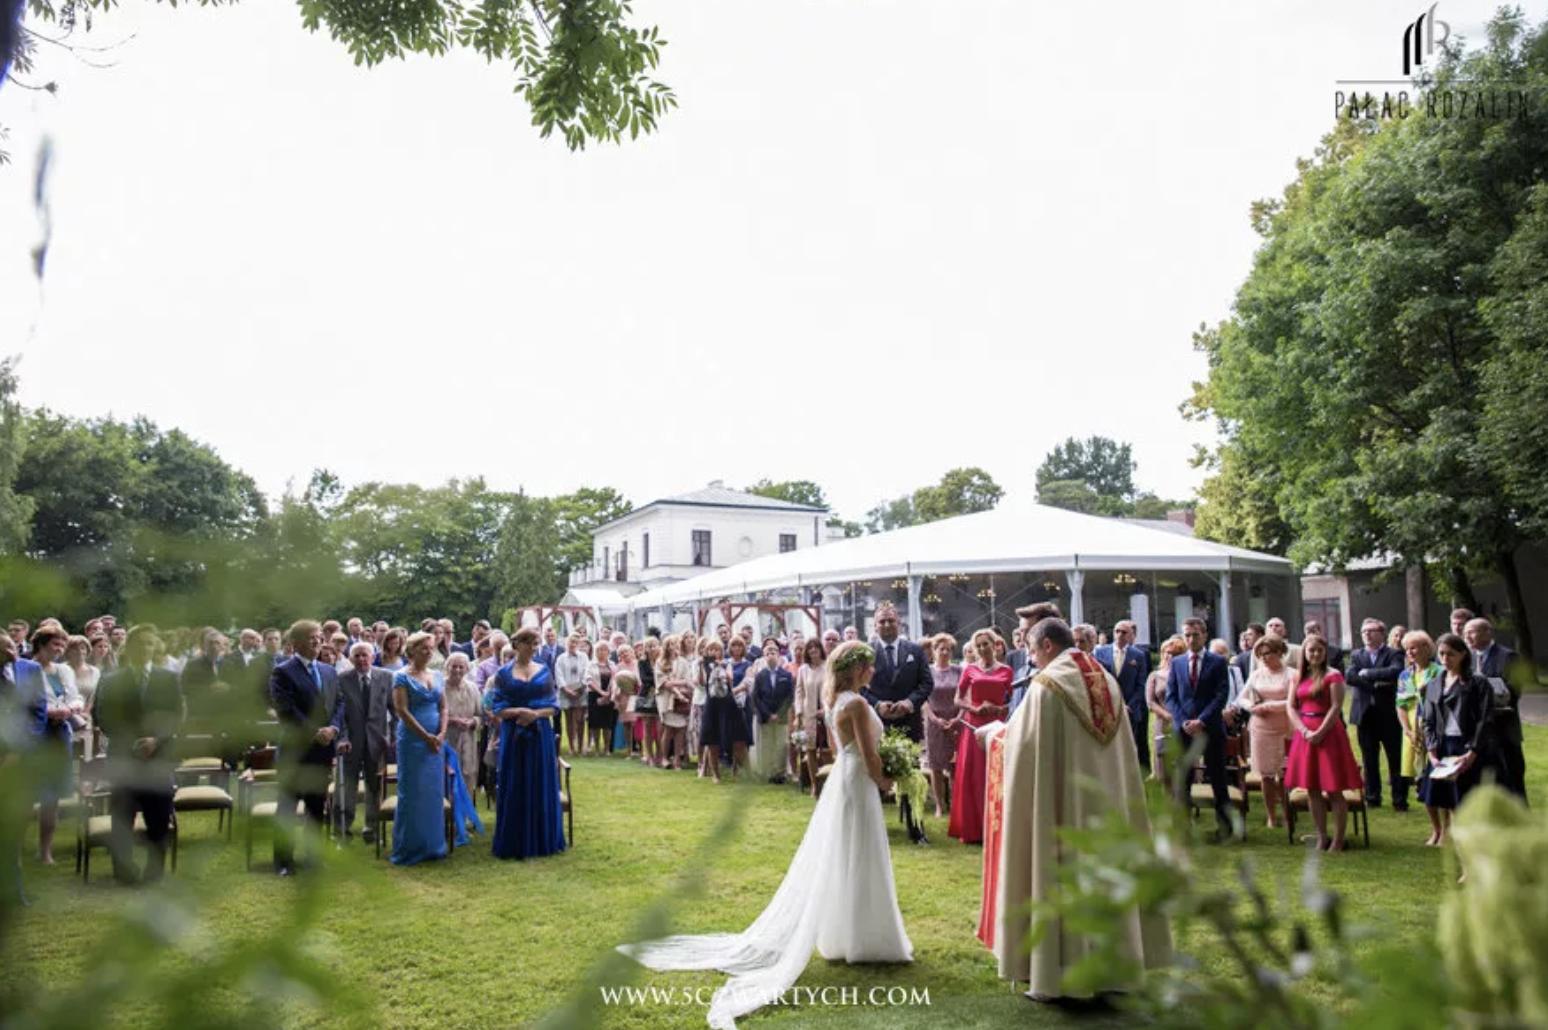 Ślub kościelny na terenie Parku Rozalin